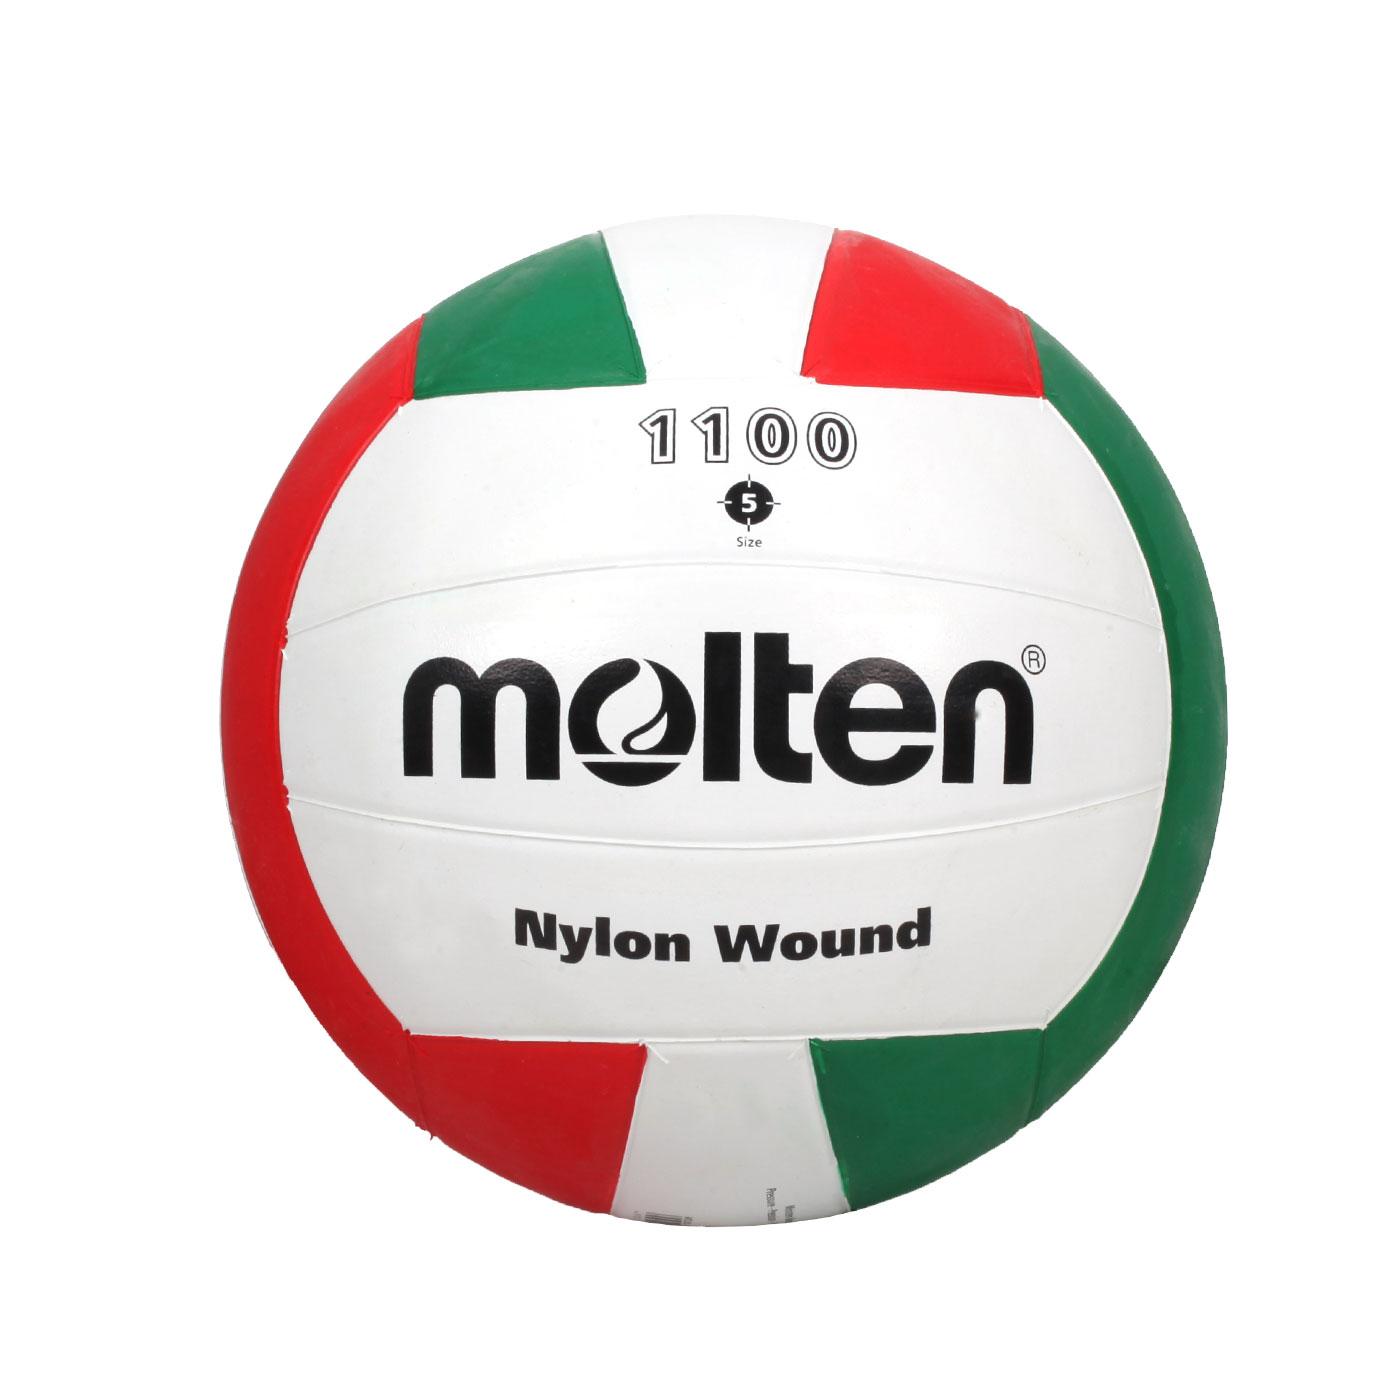 Molten #5橡膠排球 V5C1100 - 白紅綠